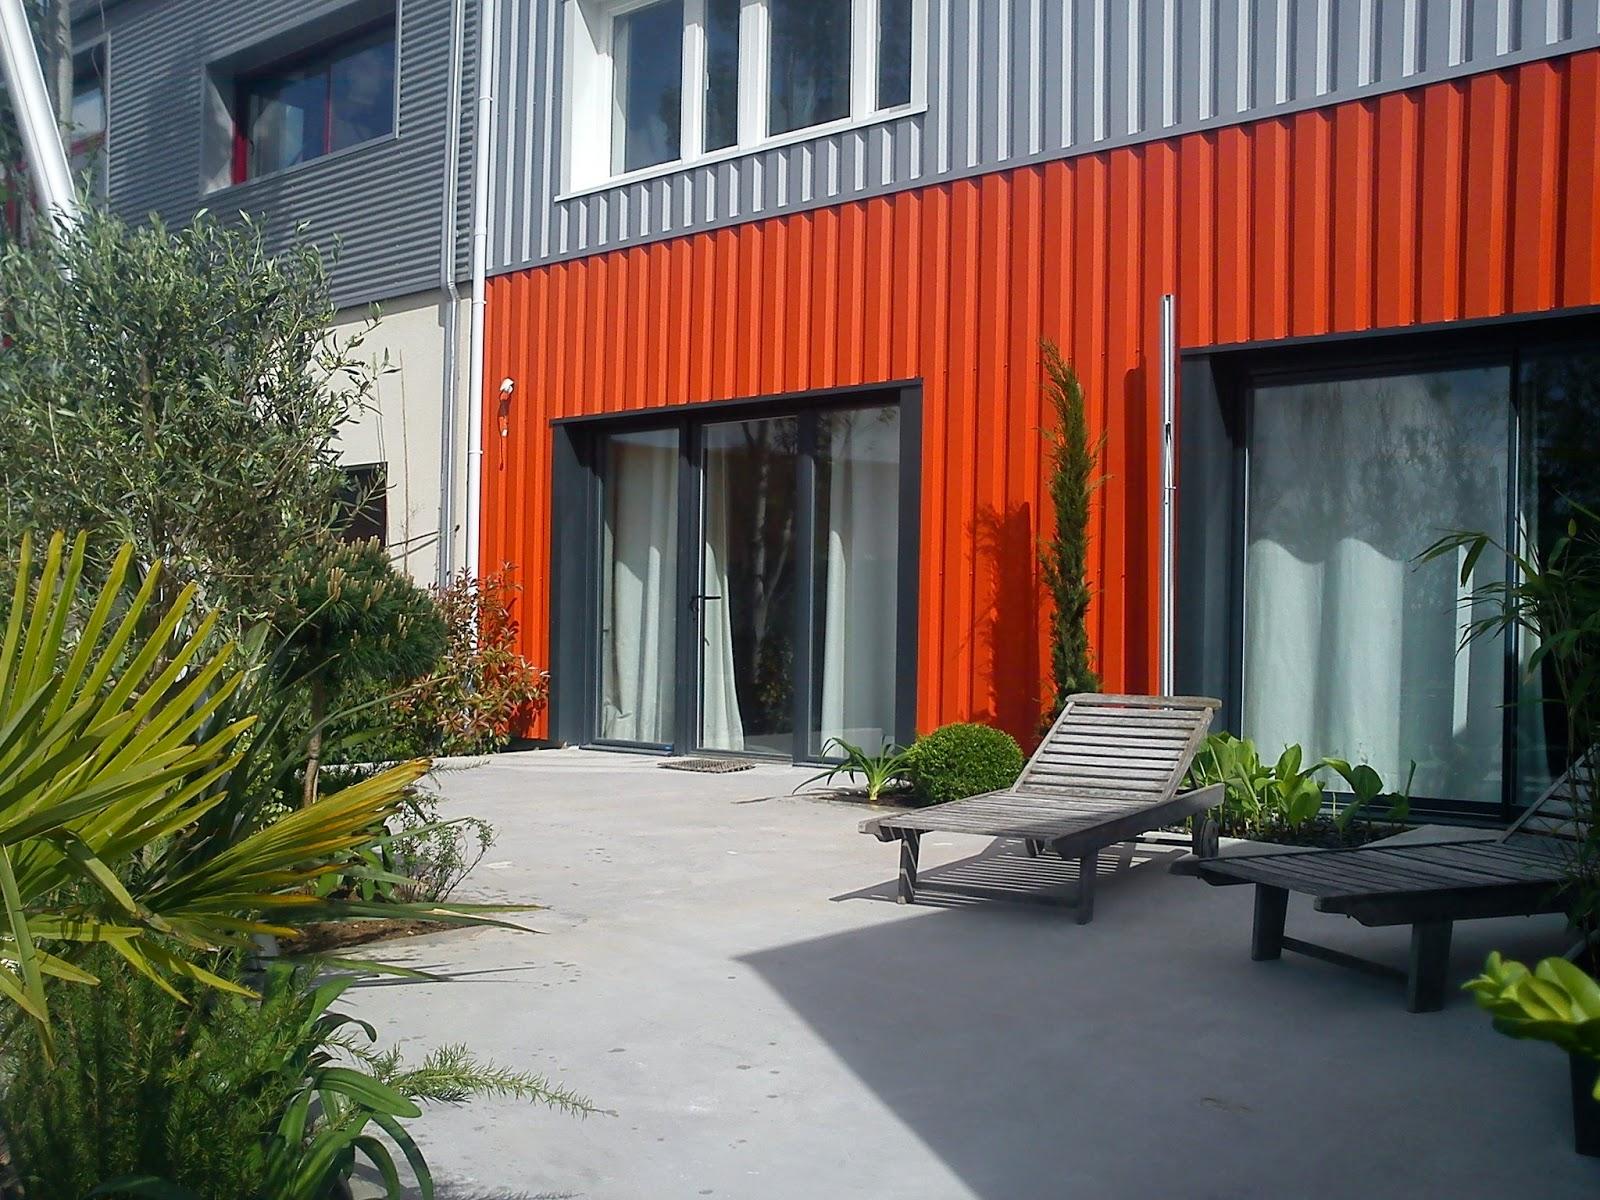 Townhouse landscape design eight professional tips for for Townhouse landscape design